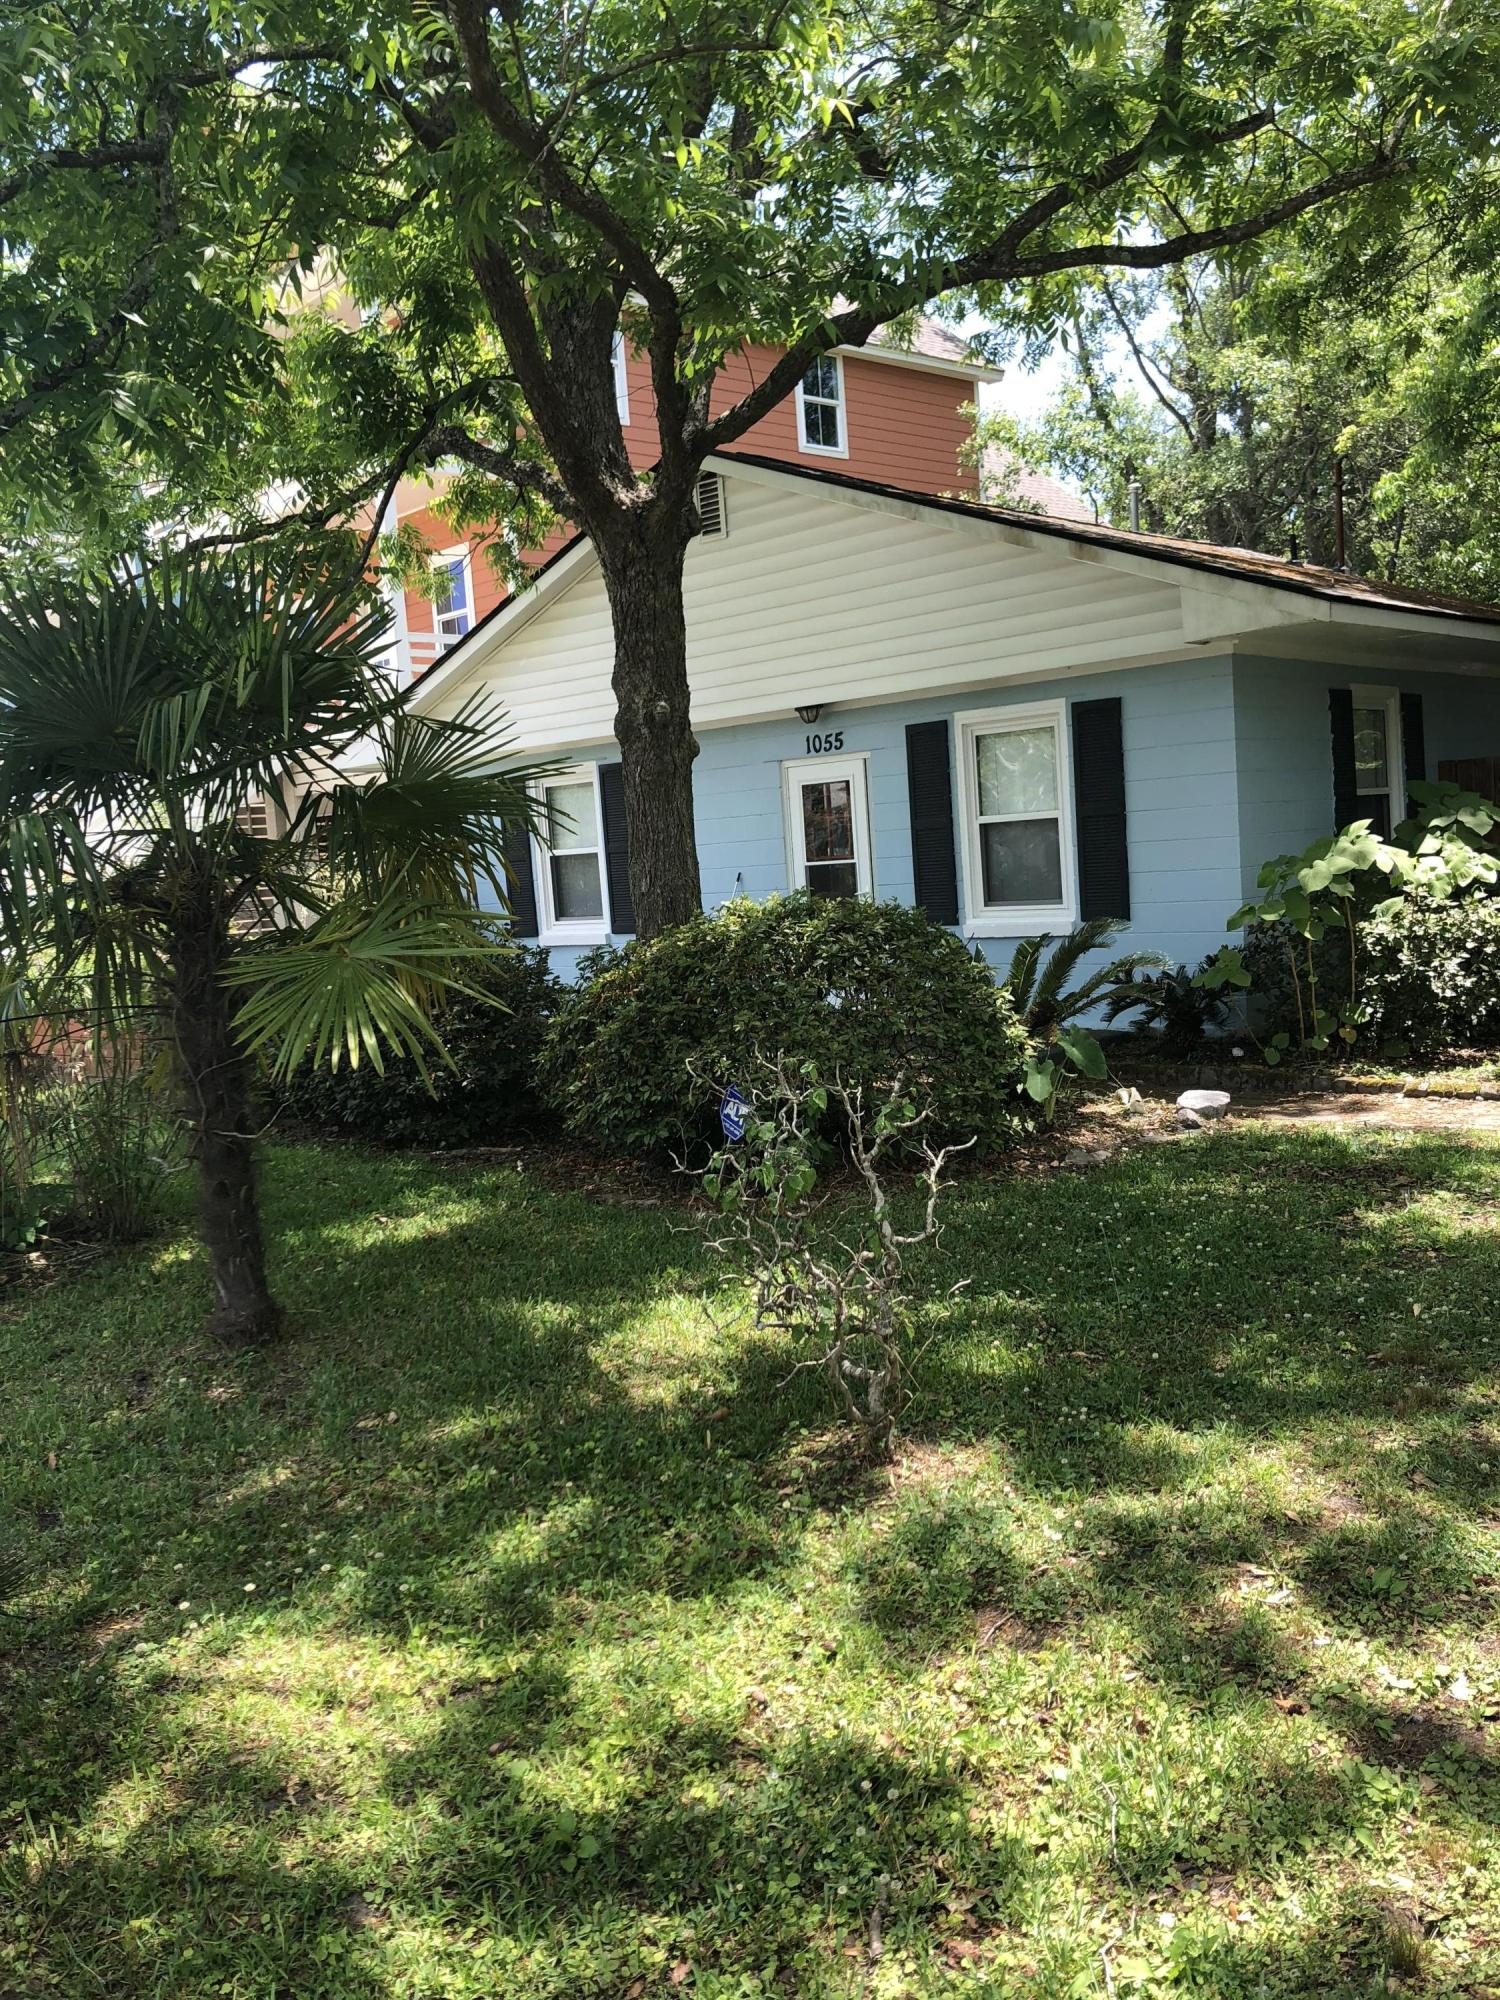 1055 Glenshaw Street North Charleston, SC 29405